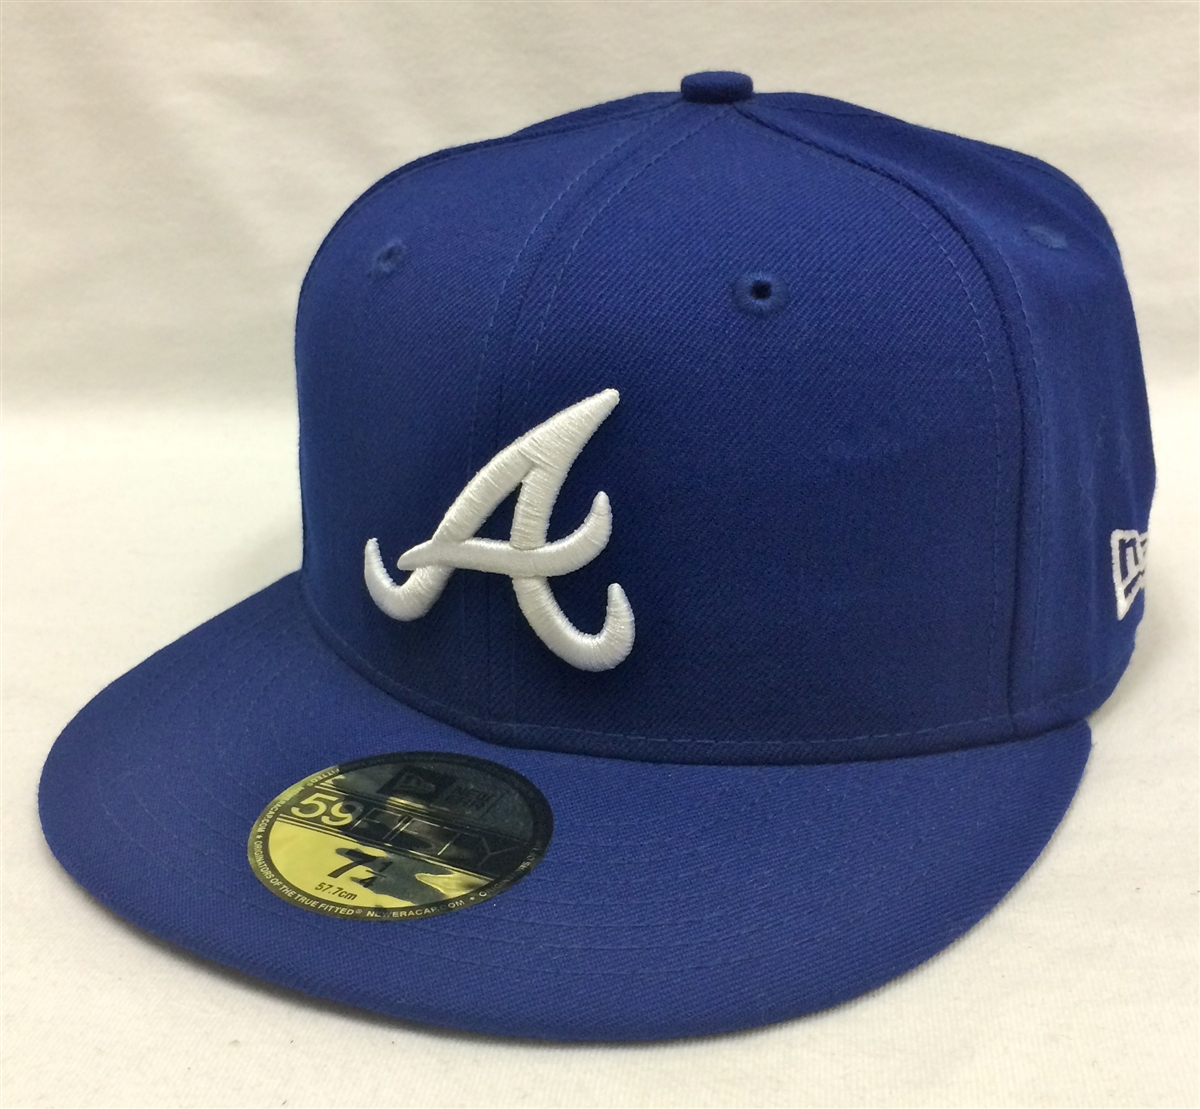 New Era 59Fifty MLB Basic Atlanta Braves Blue Fitted Cap